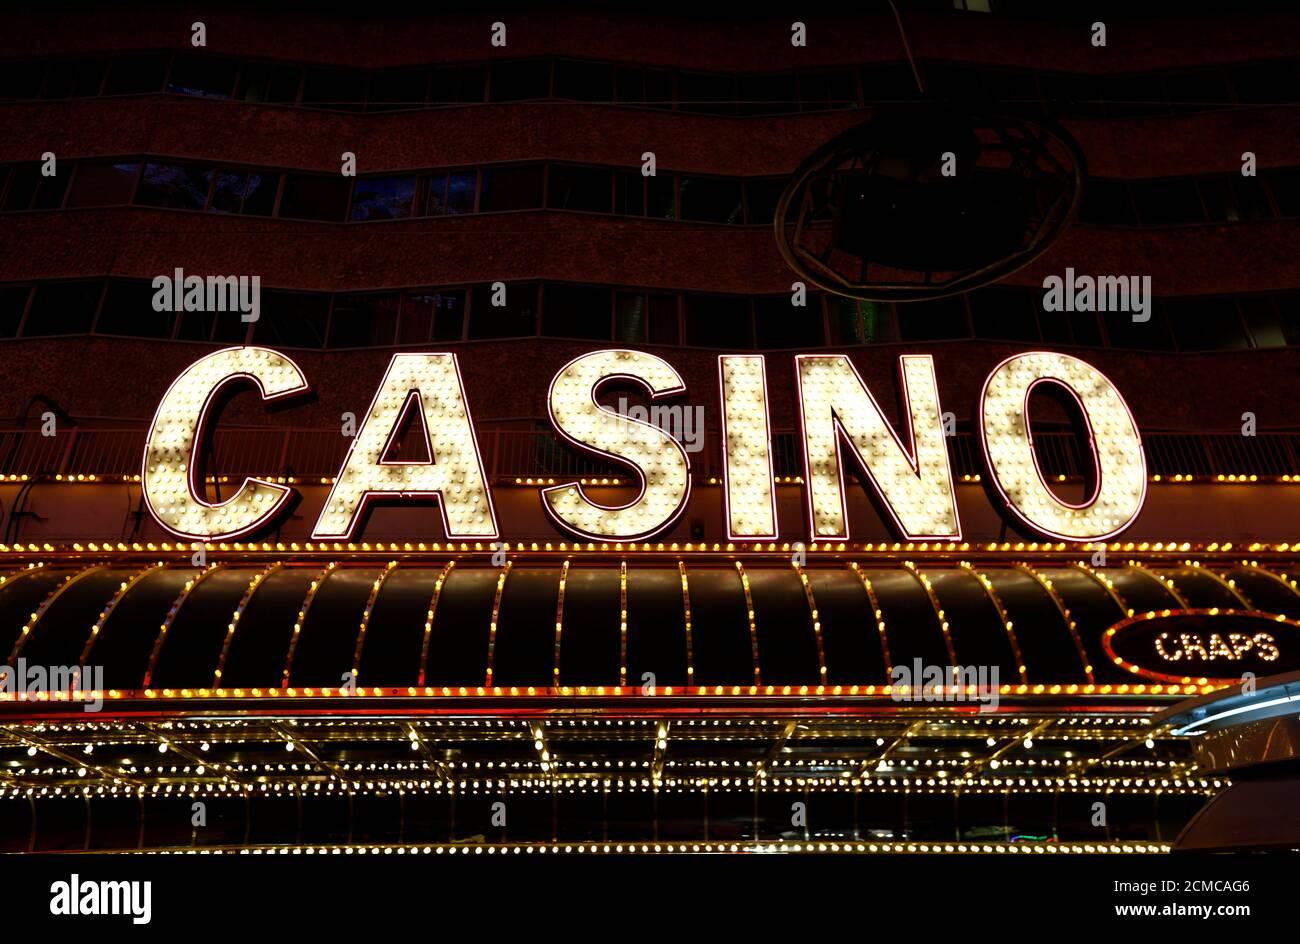 Cmca casino watch dota 2 games